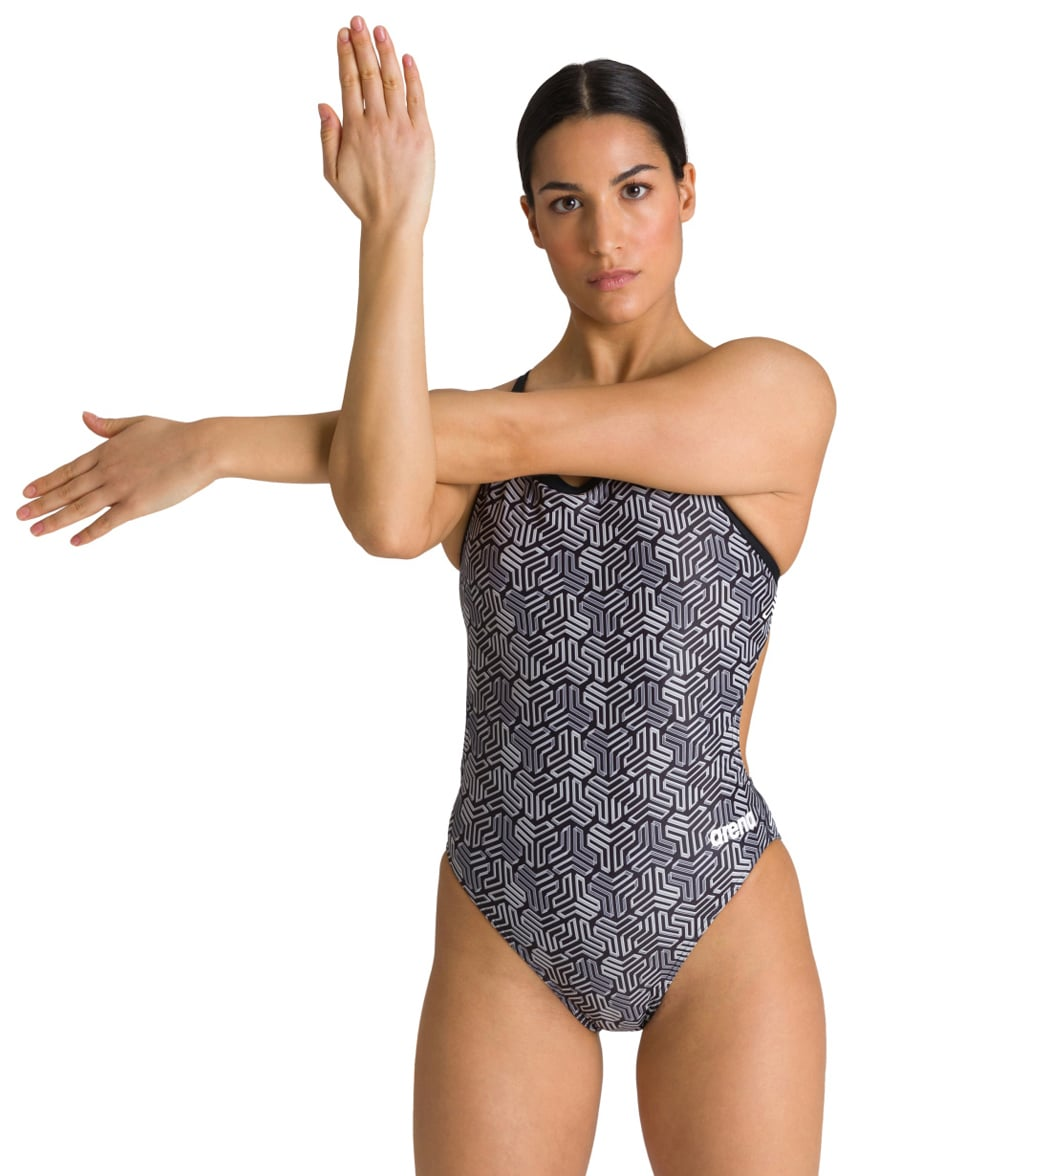 Arena Women's Kikko Maxlife Challenge Back One Piece Swimsuit-Multi Black Black